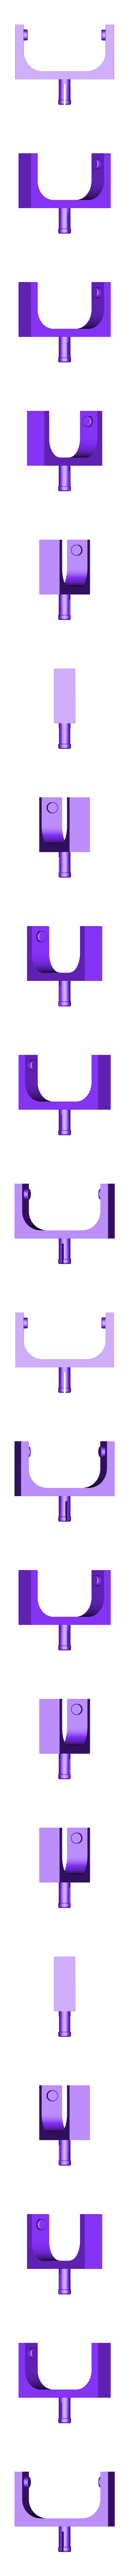 camera_mount_hinge.stl Download free STL file Raspberry Pi camera mount for Flashforge Creator Pro • 3D print model, Cerragh